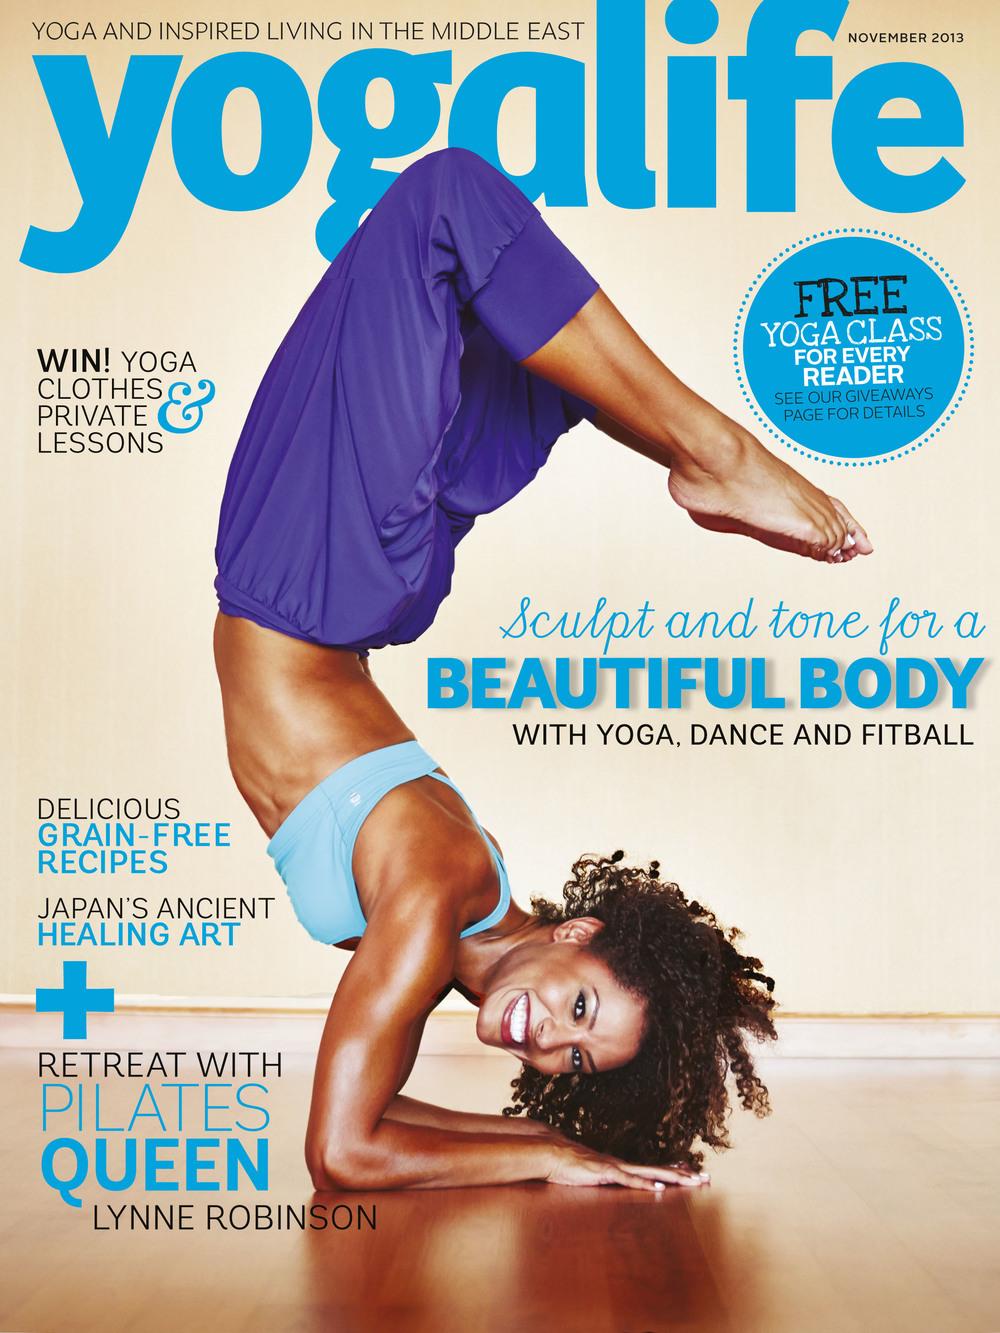 yogalife.2013.11.YL10_cover.jpg